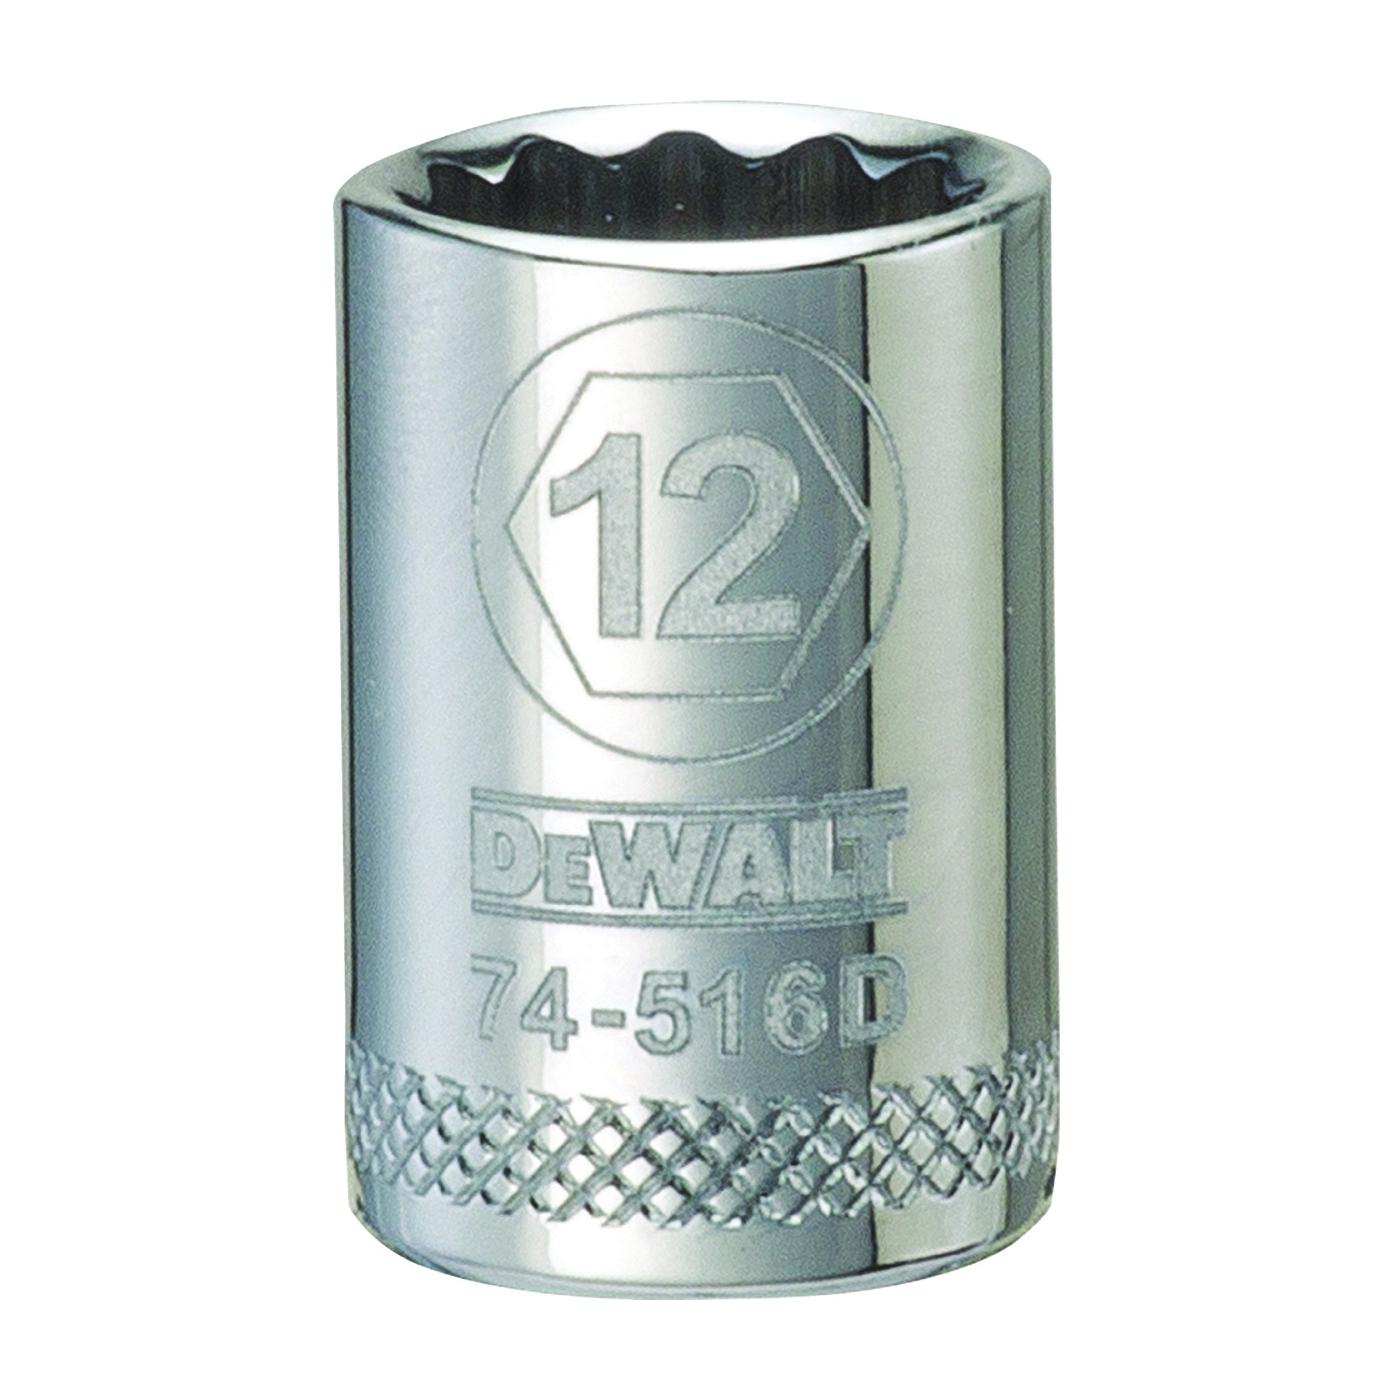 Picture of DeWALT DWMT74516OSP Hand Socket, 12 mm Socket, 3/8 in Drive, 12 -Point, Vanadium Steel, Polished Chrome